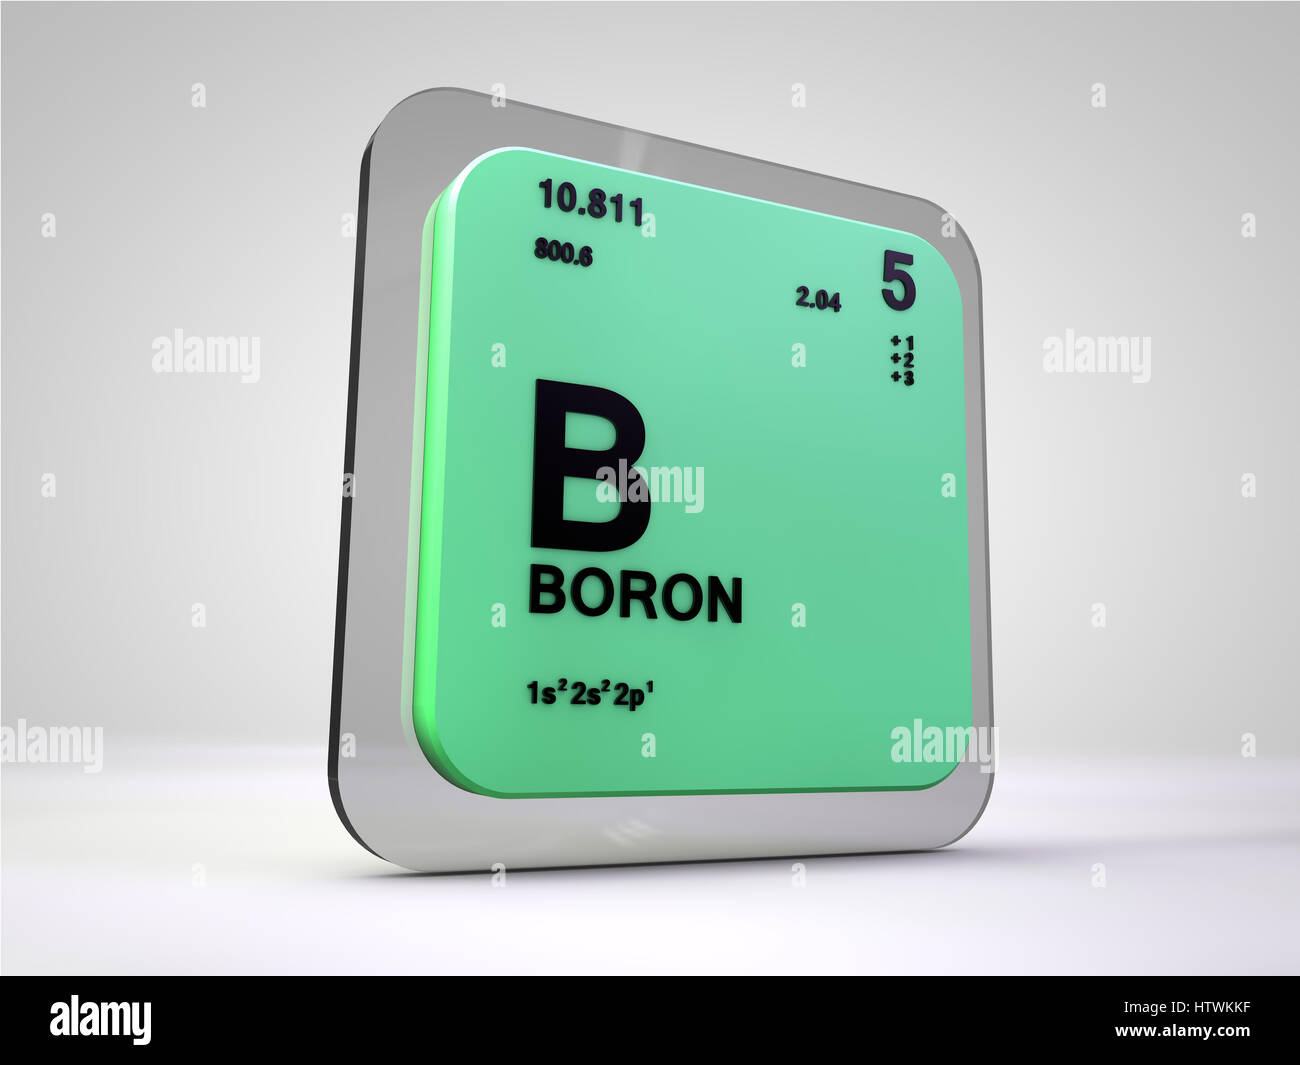 Boron element stock photos boron element stock images alamy boron b chemical element periodic table 3d render stock image ccuart Gallery